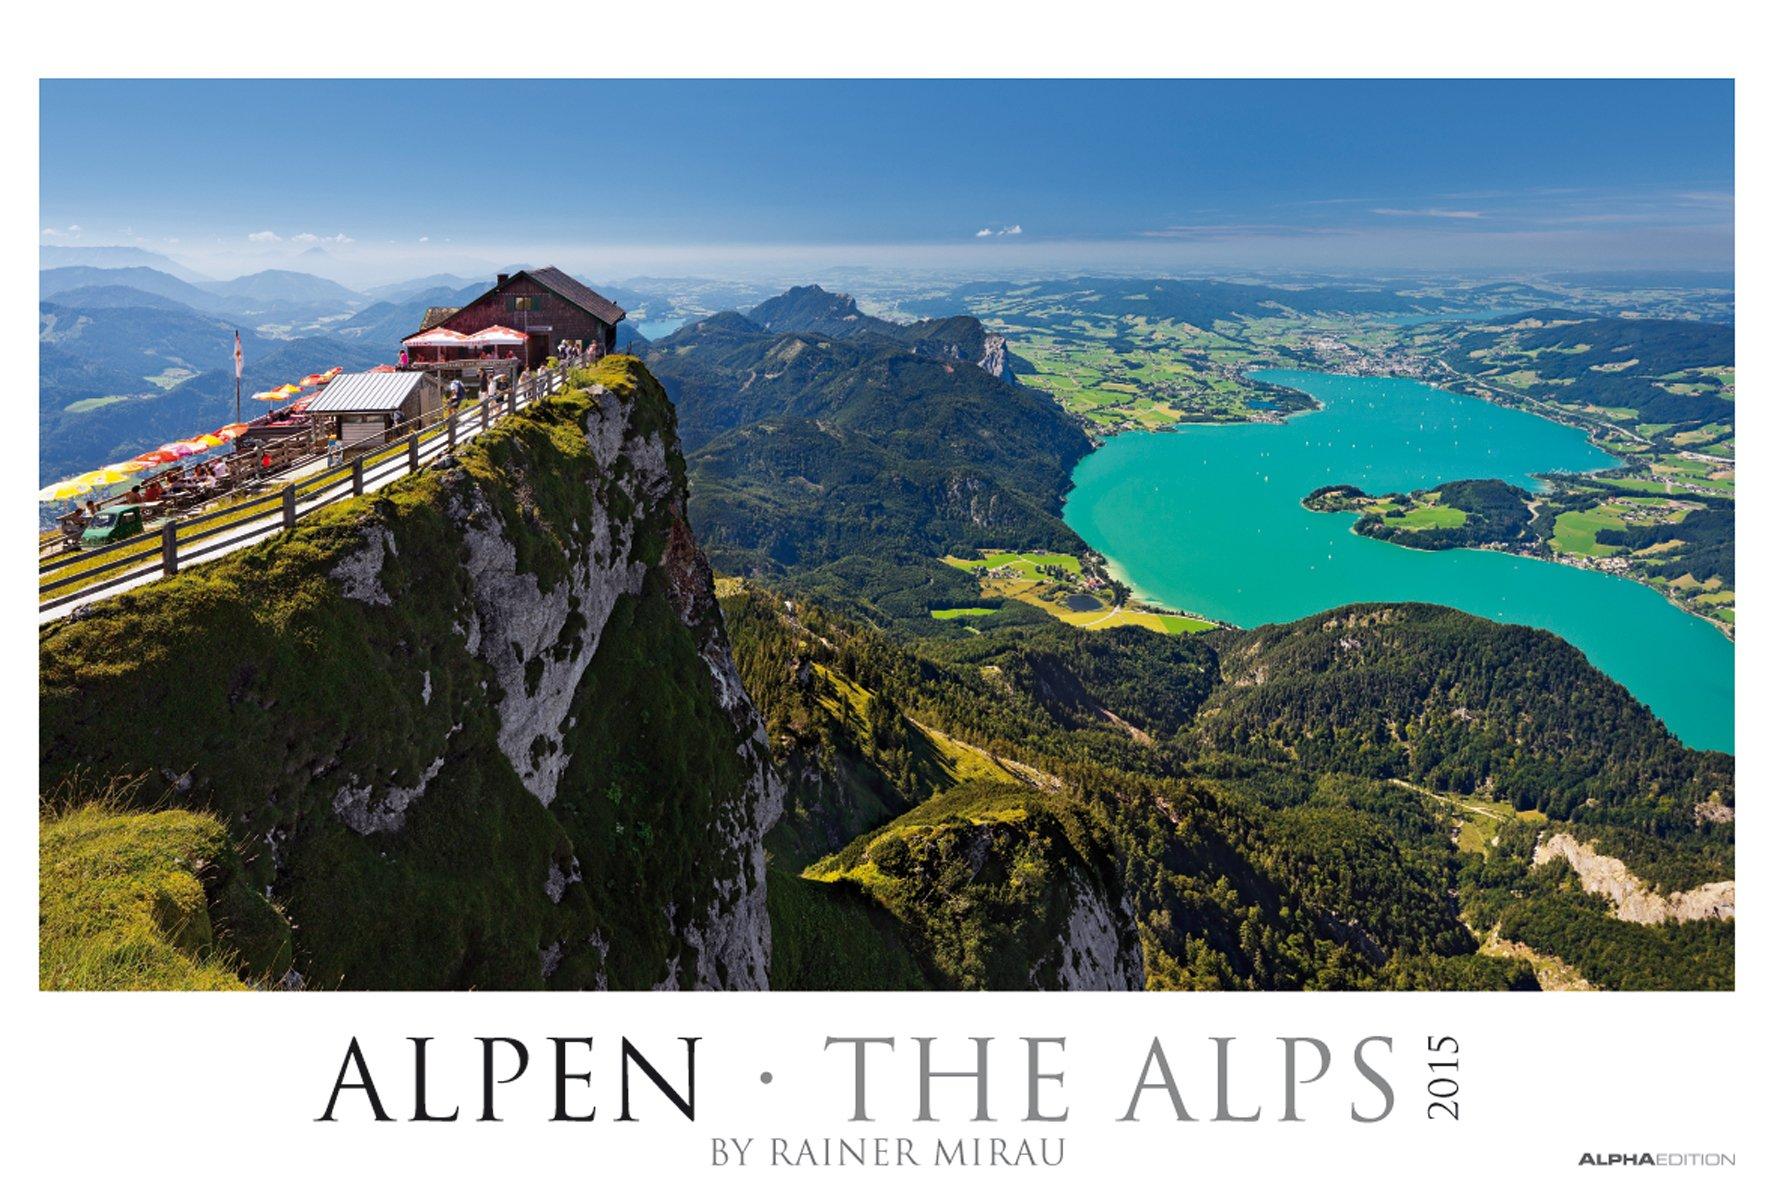 Alpen 2015 - The Alps - Bildkalender XXL (68 x 46) - Landschaftskalender - by Rainer Mirau